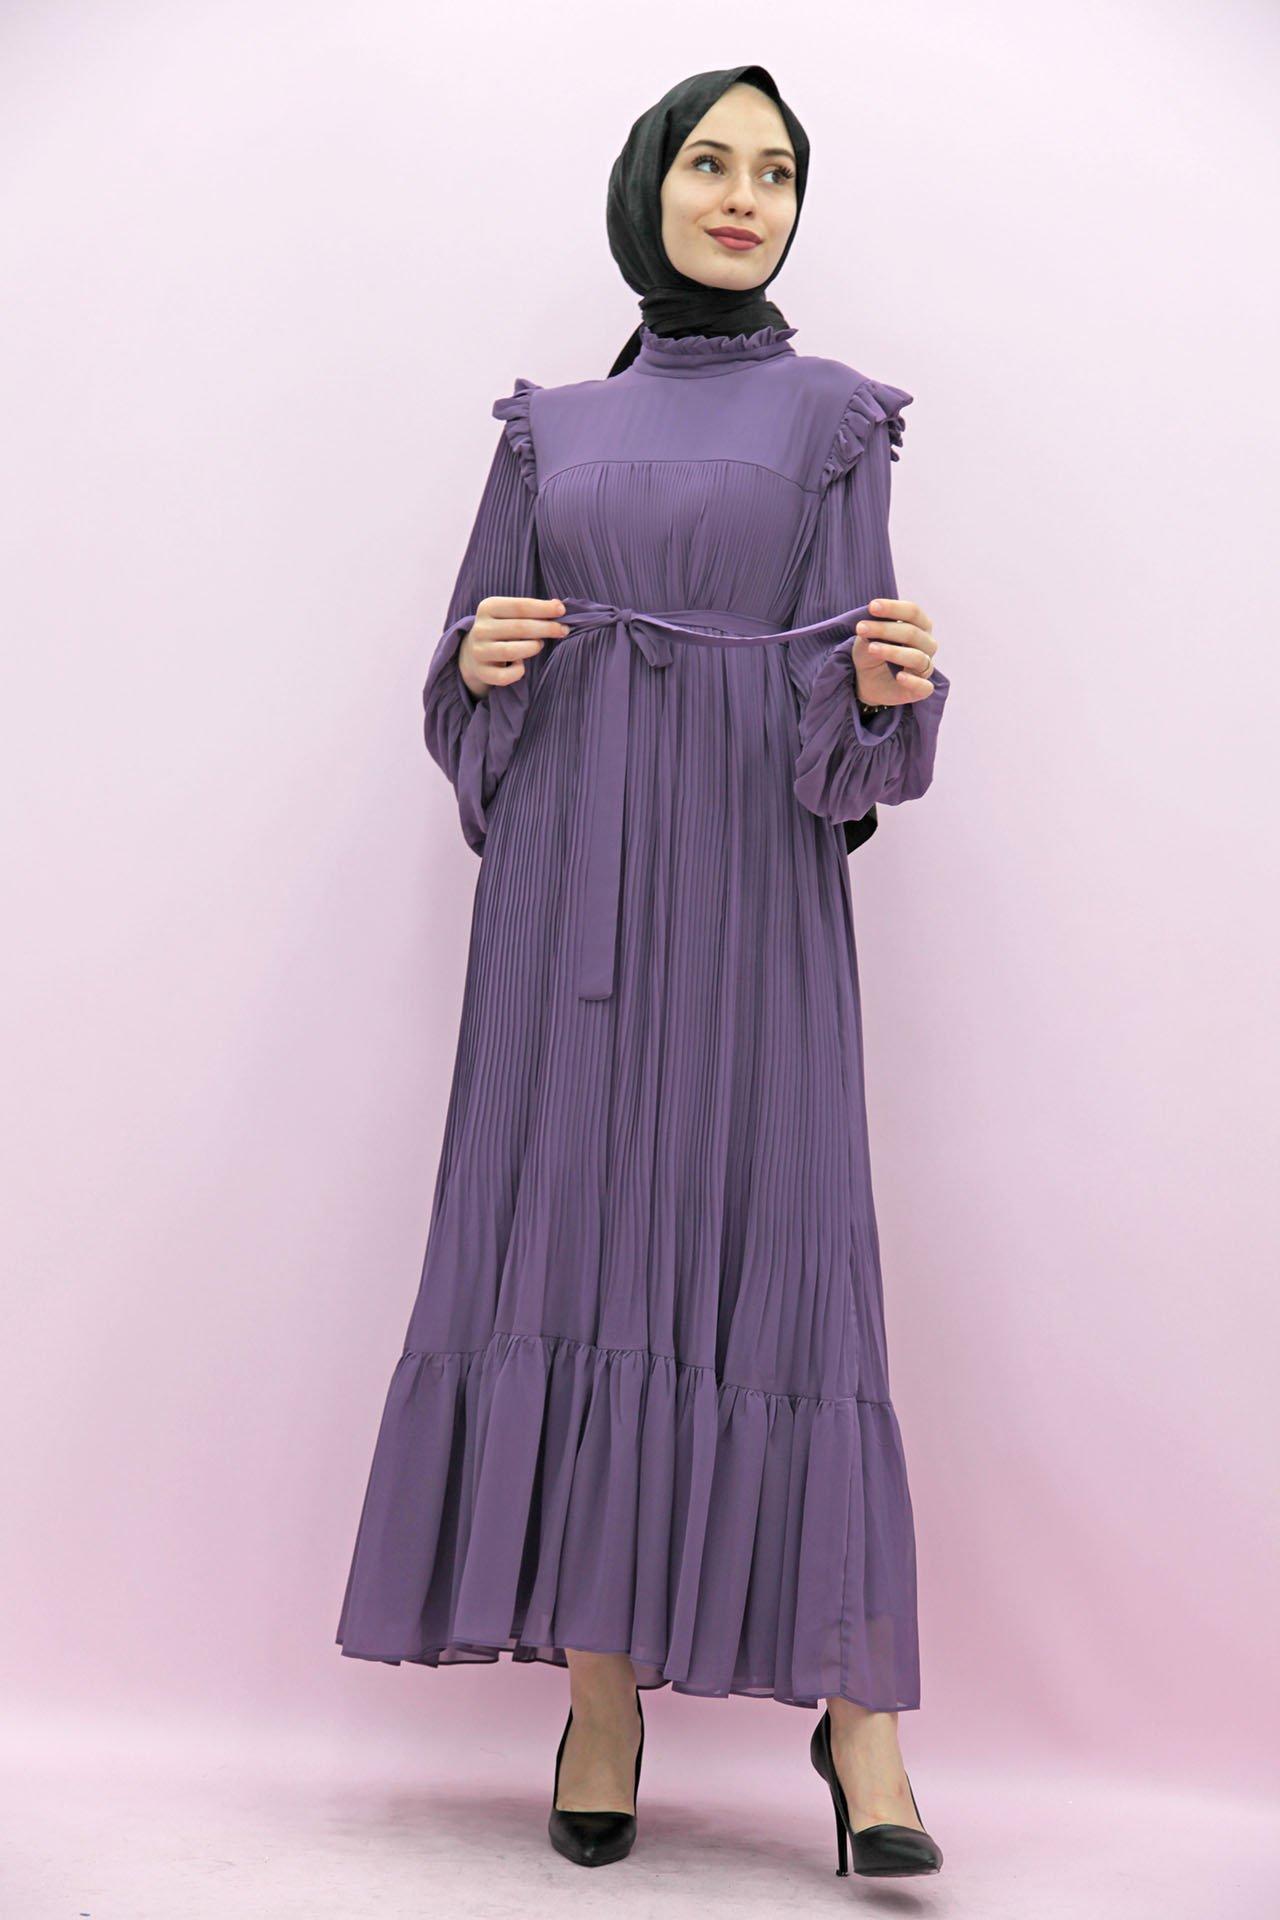 GİZAGİYİM - Omzu Fırfırlı Pilisoley Elbise Mor